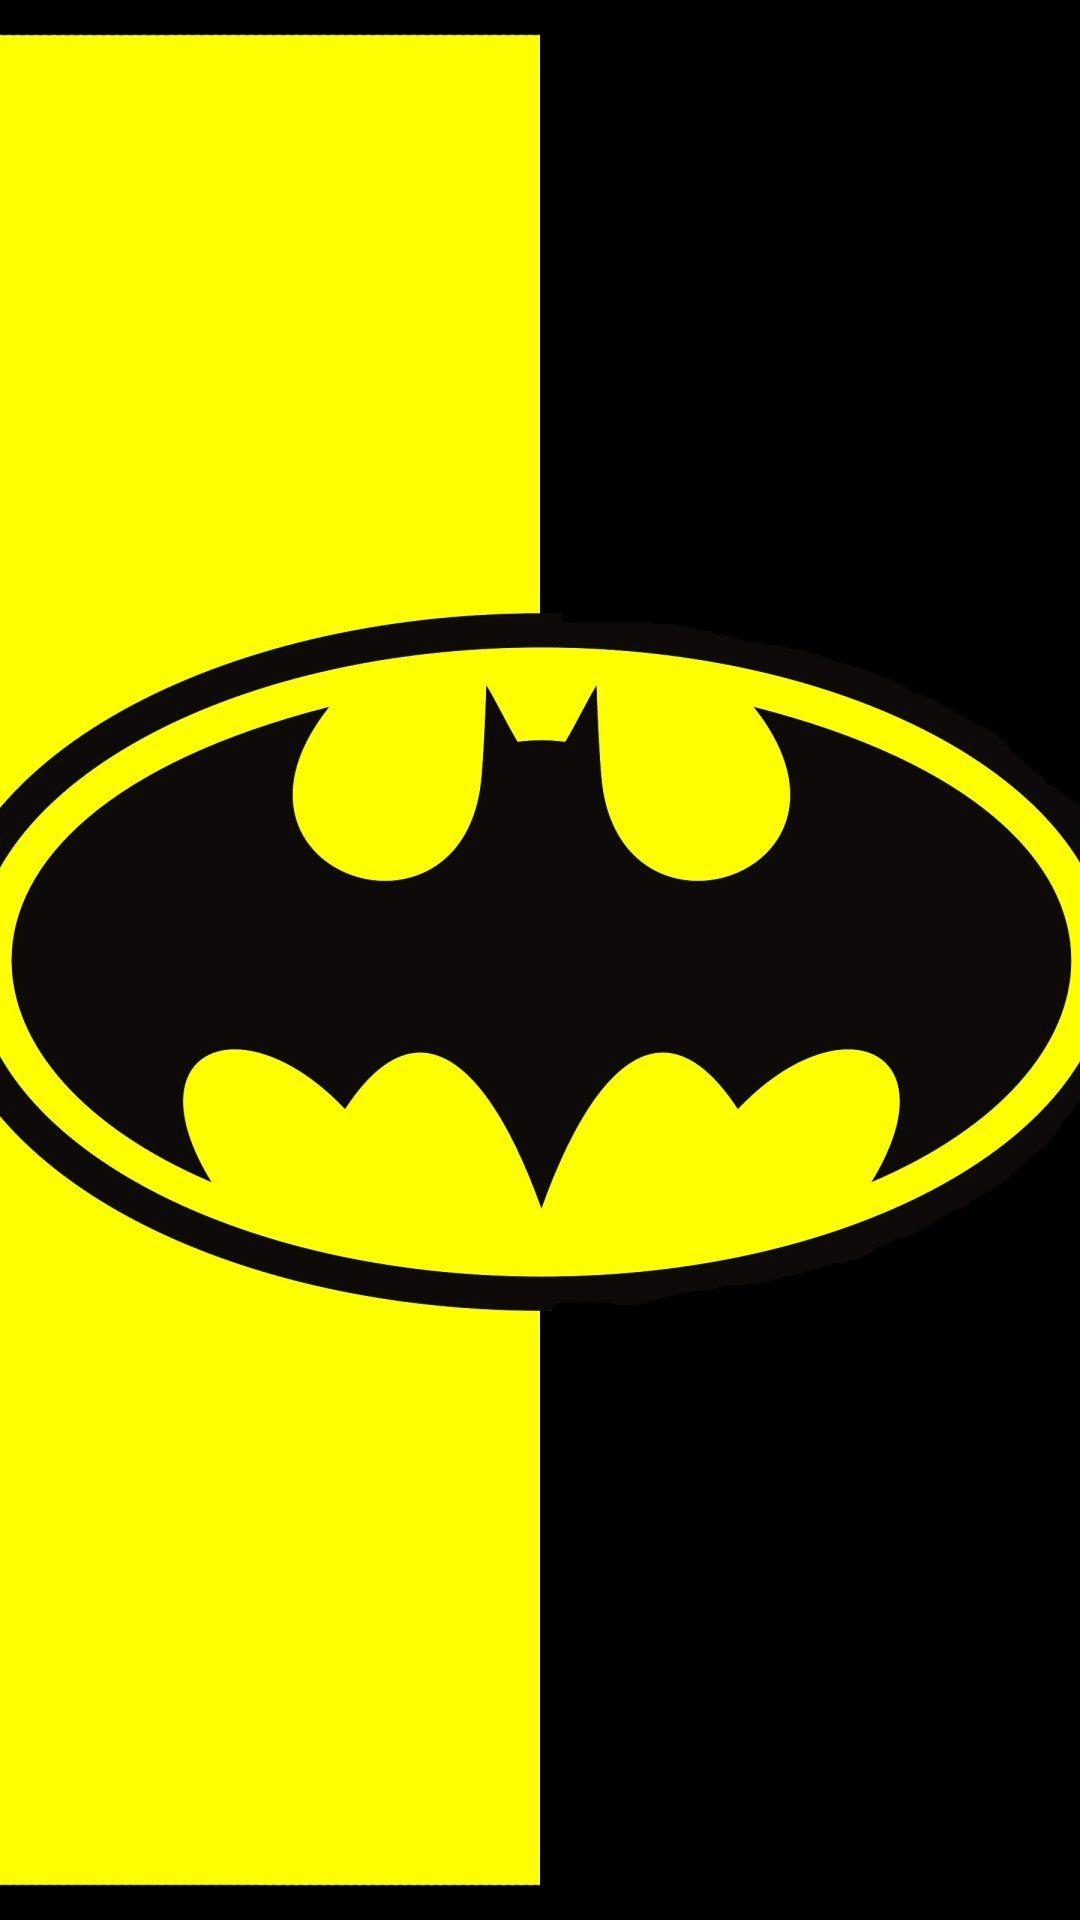 The Batman 2021 Logo iPhone Wallpapers - Wallpaper Cave